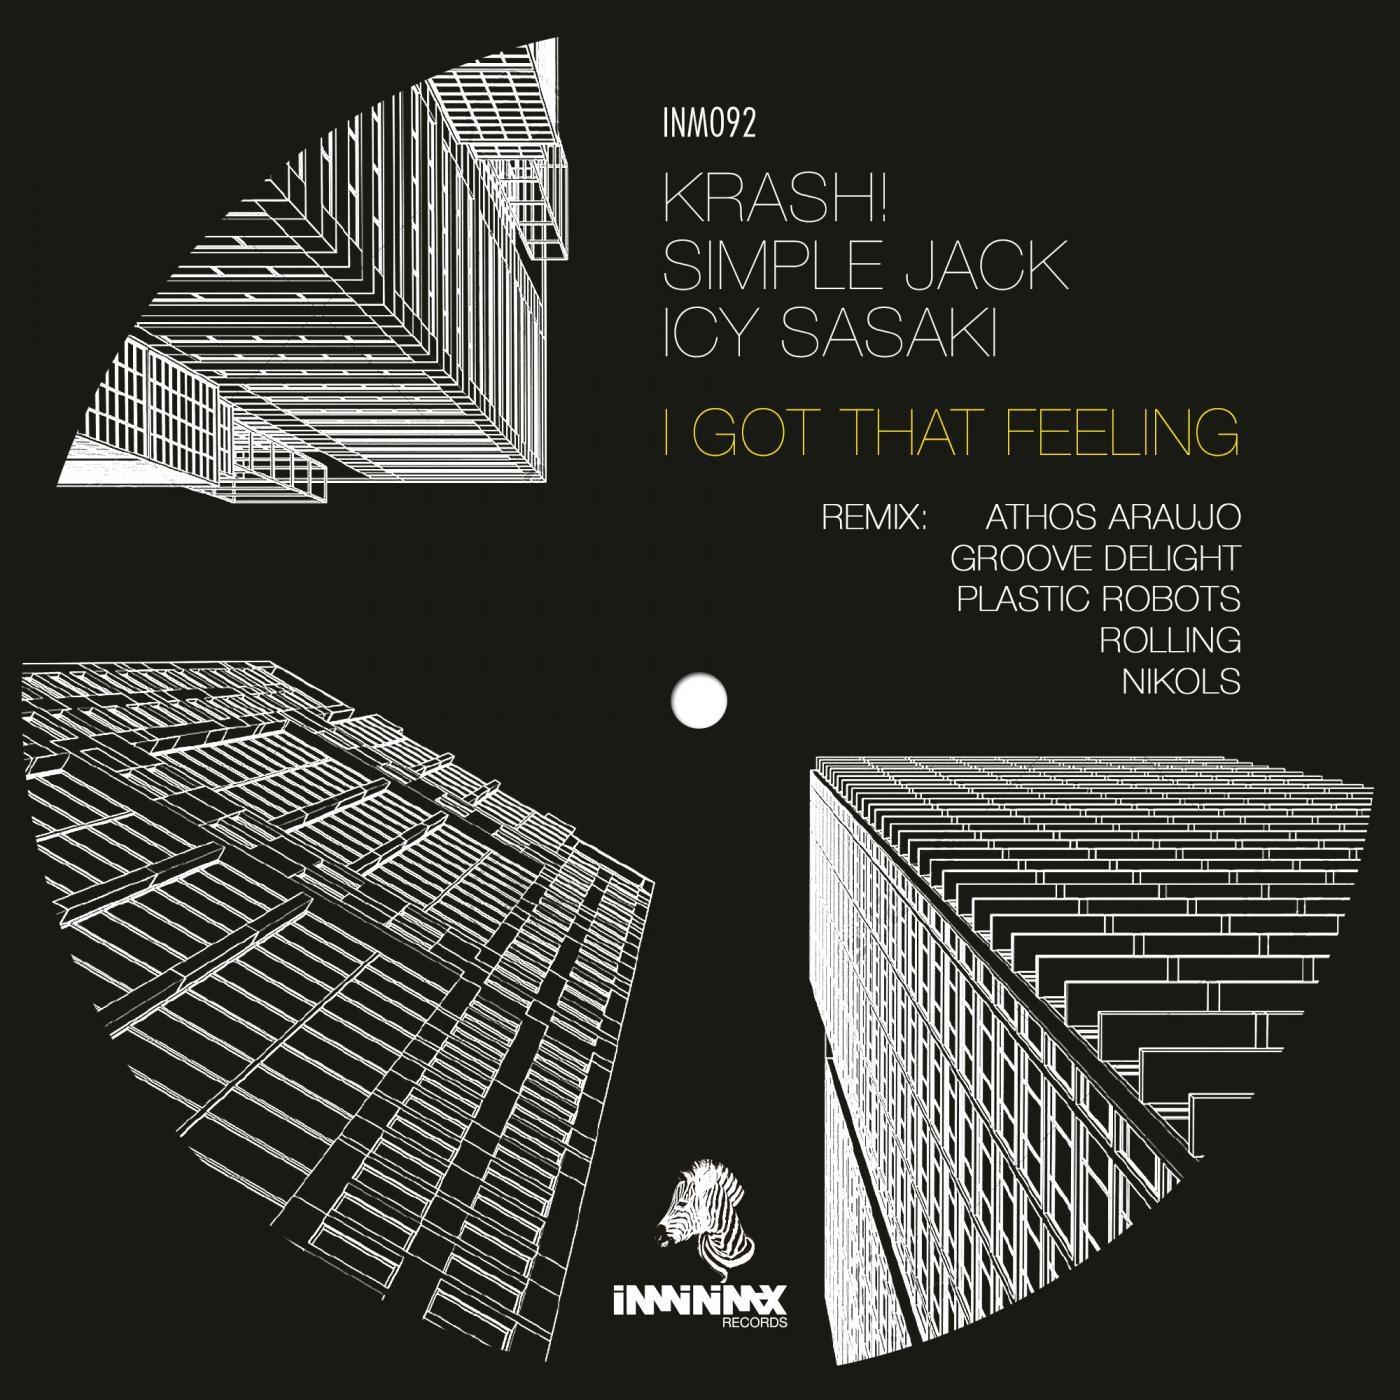 Icy Sasaki & KRASH! & Simple Jack - I Got That Feeling (Original mix)